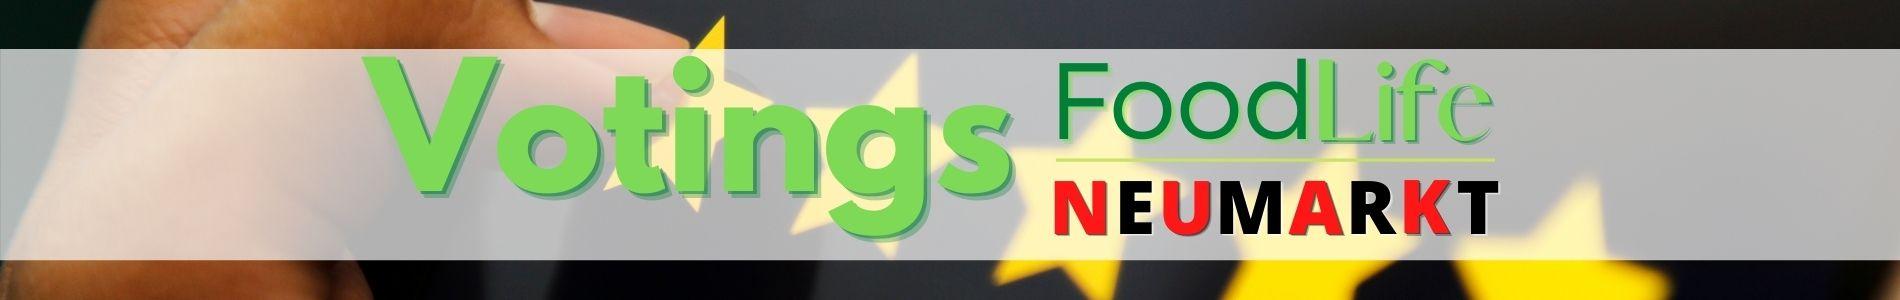 Votings FoodLife Neumark Teaser